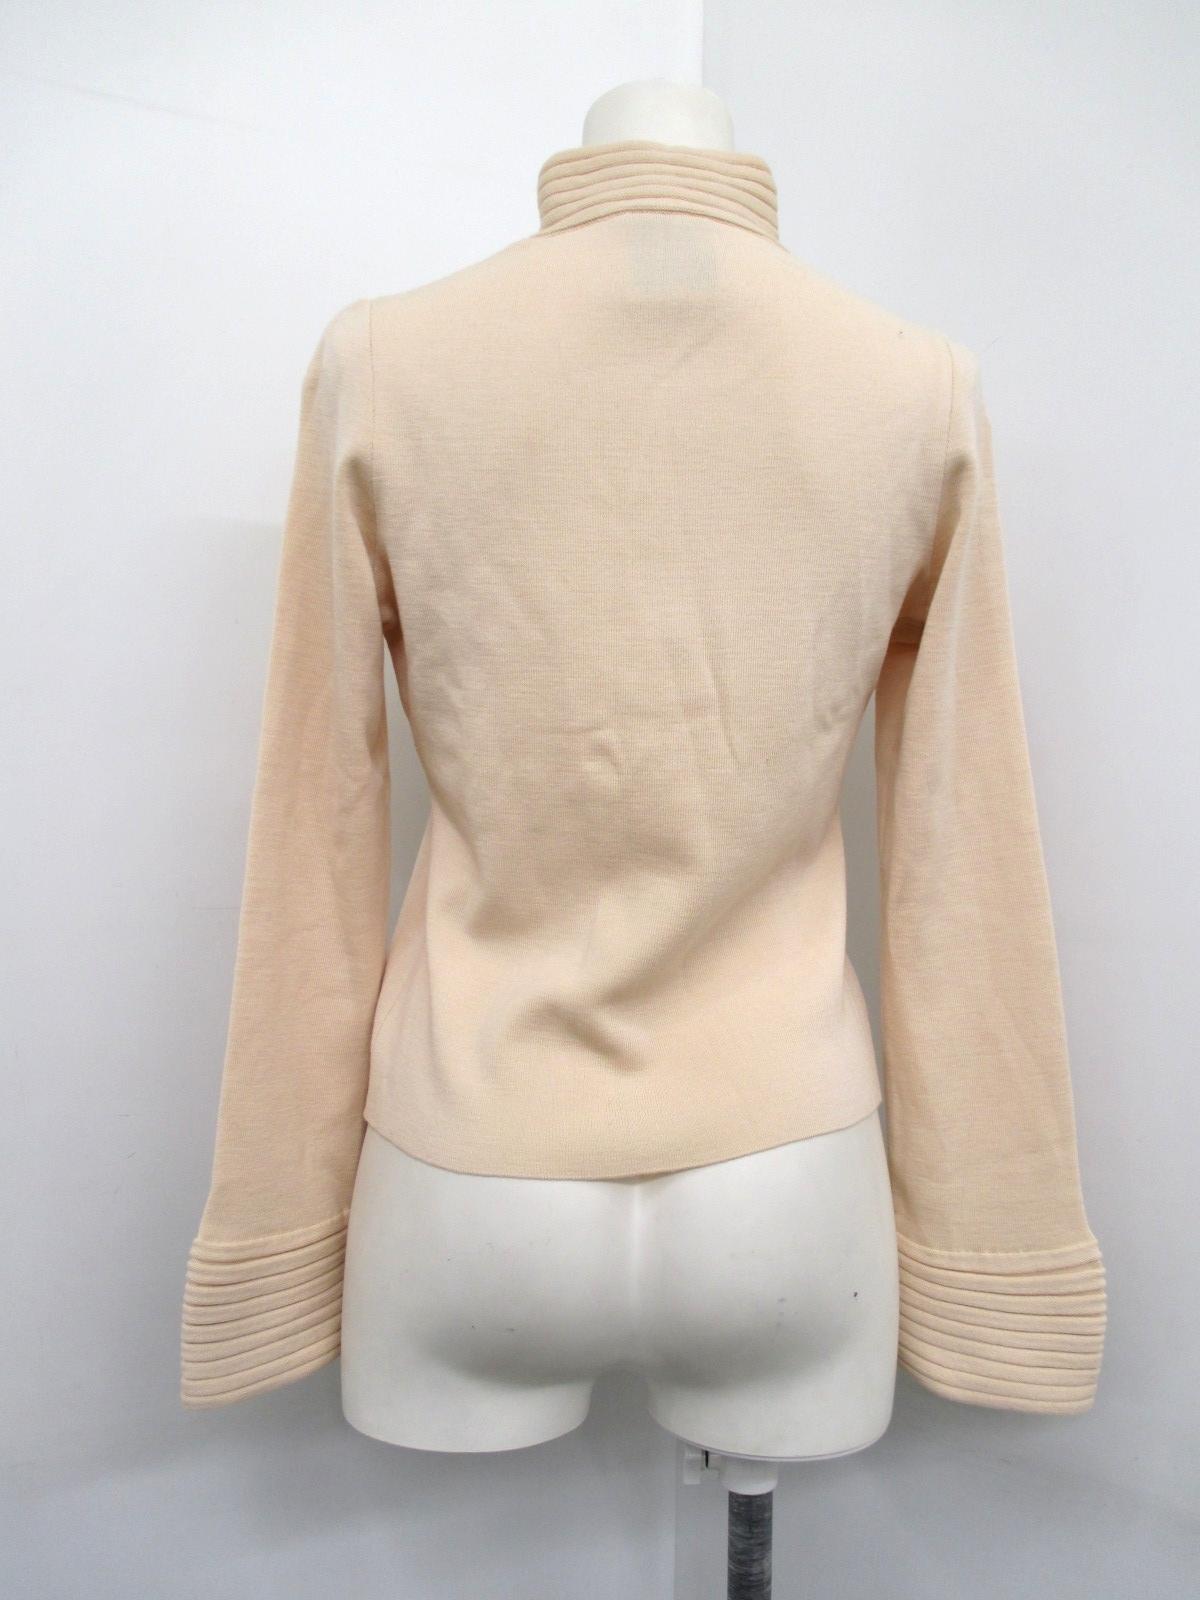 Sybilla(シビラ)のセーター